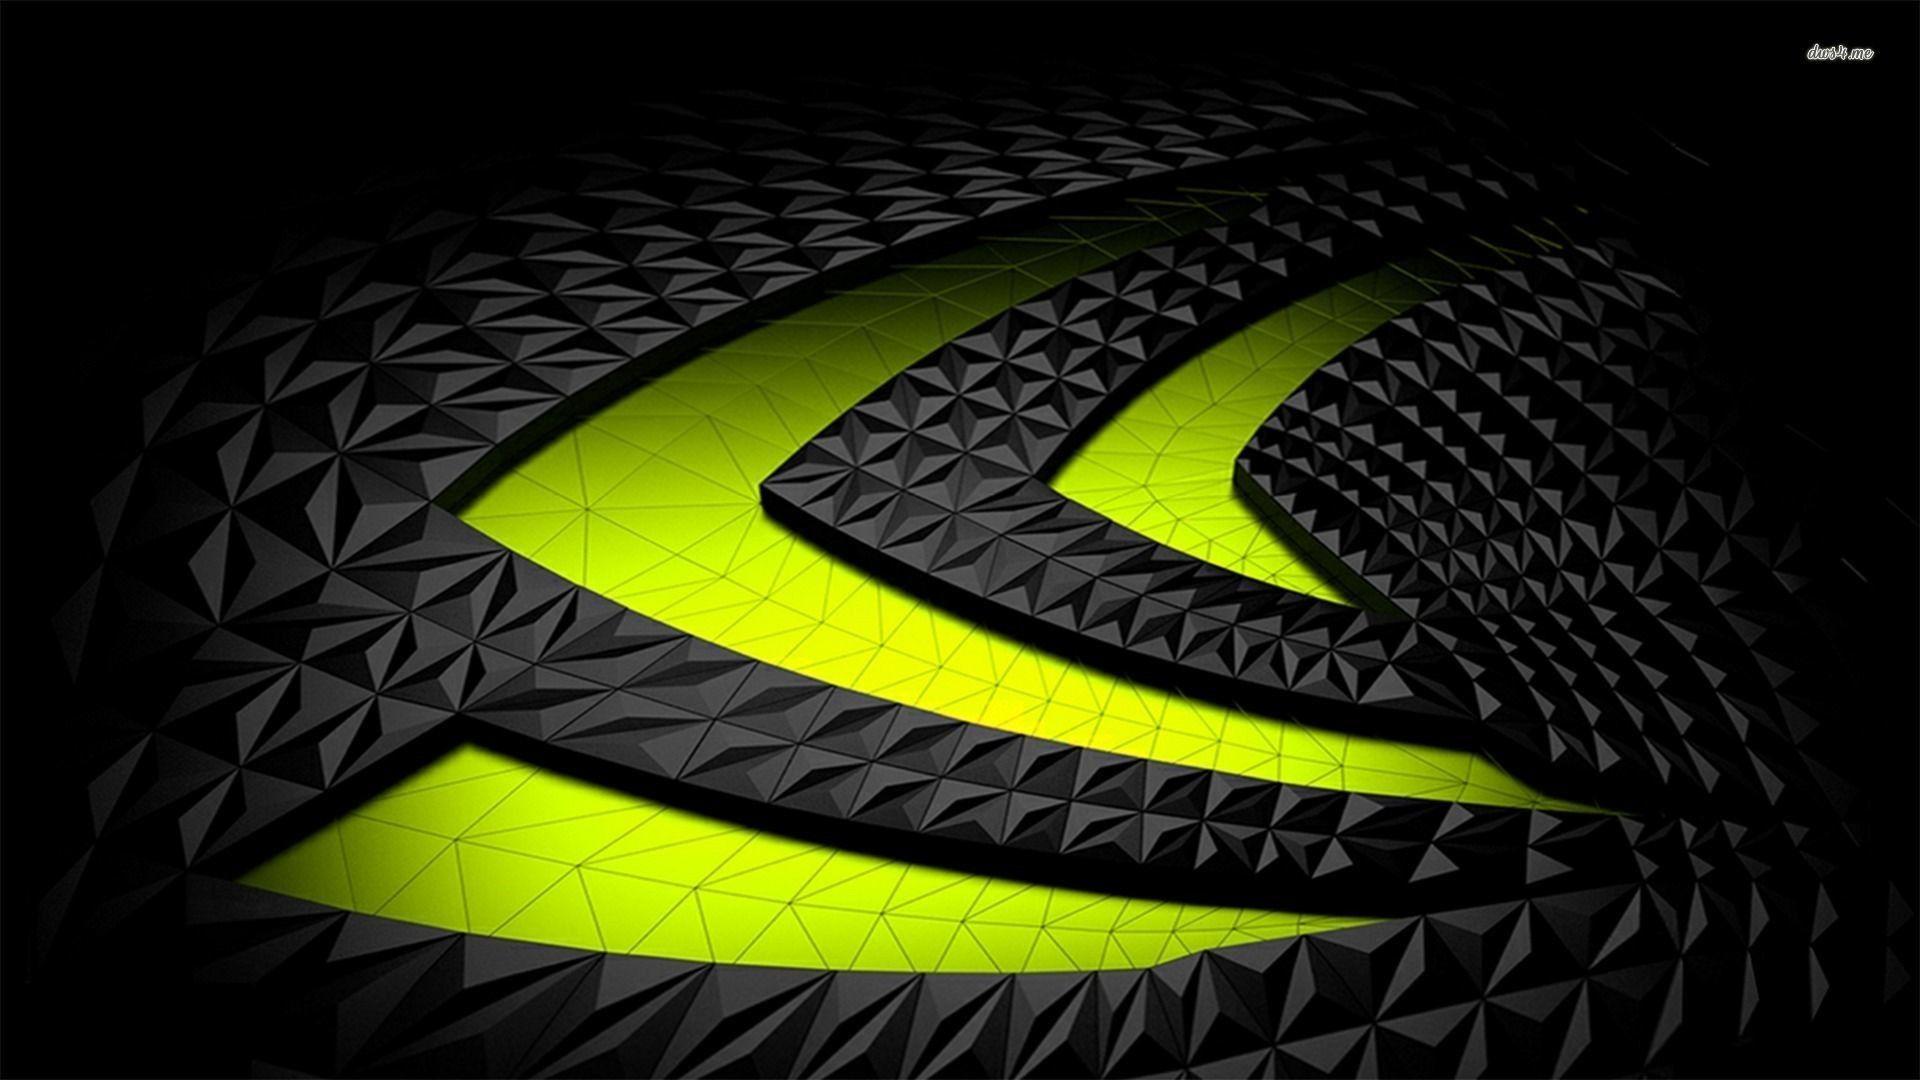 Nvidia wallpapers top free nvidia backgrounds - 1920x1080 wallpaper nvidia ...